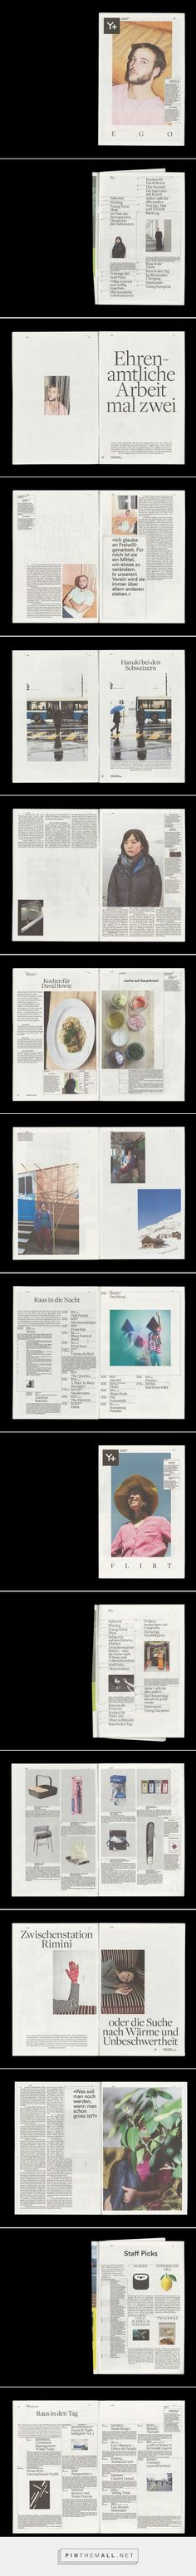 Young Swiss Magazine on Behance.